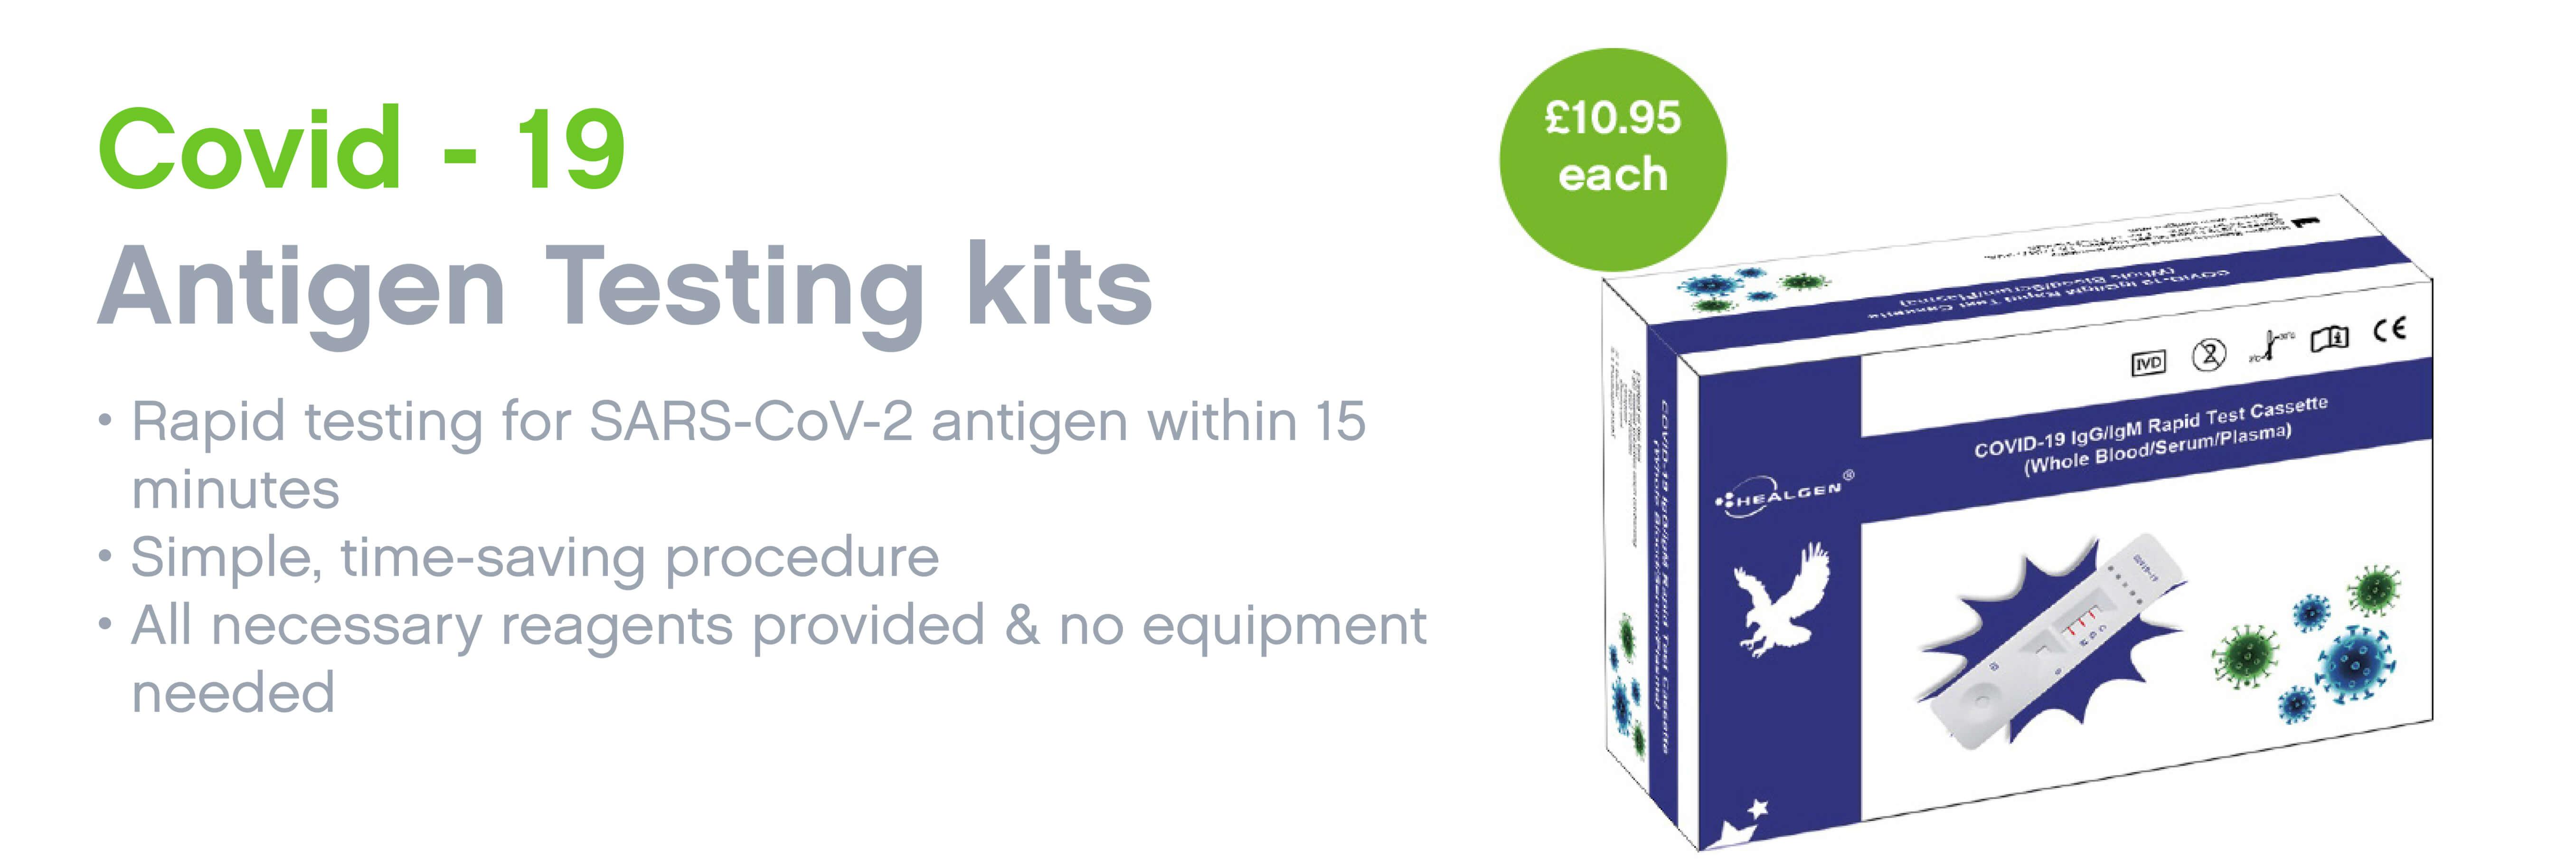 Antigen Testing Kits